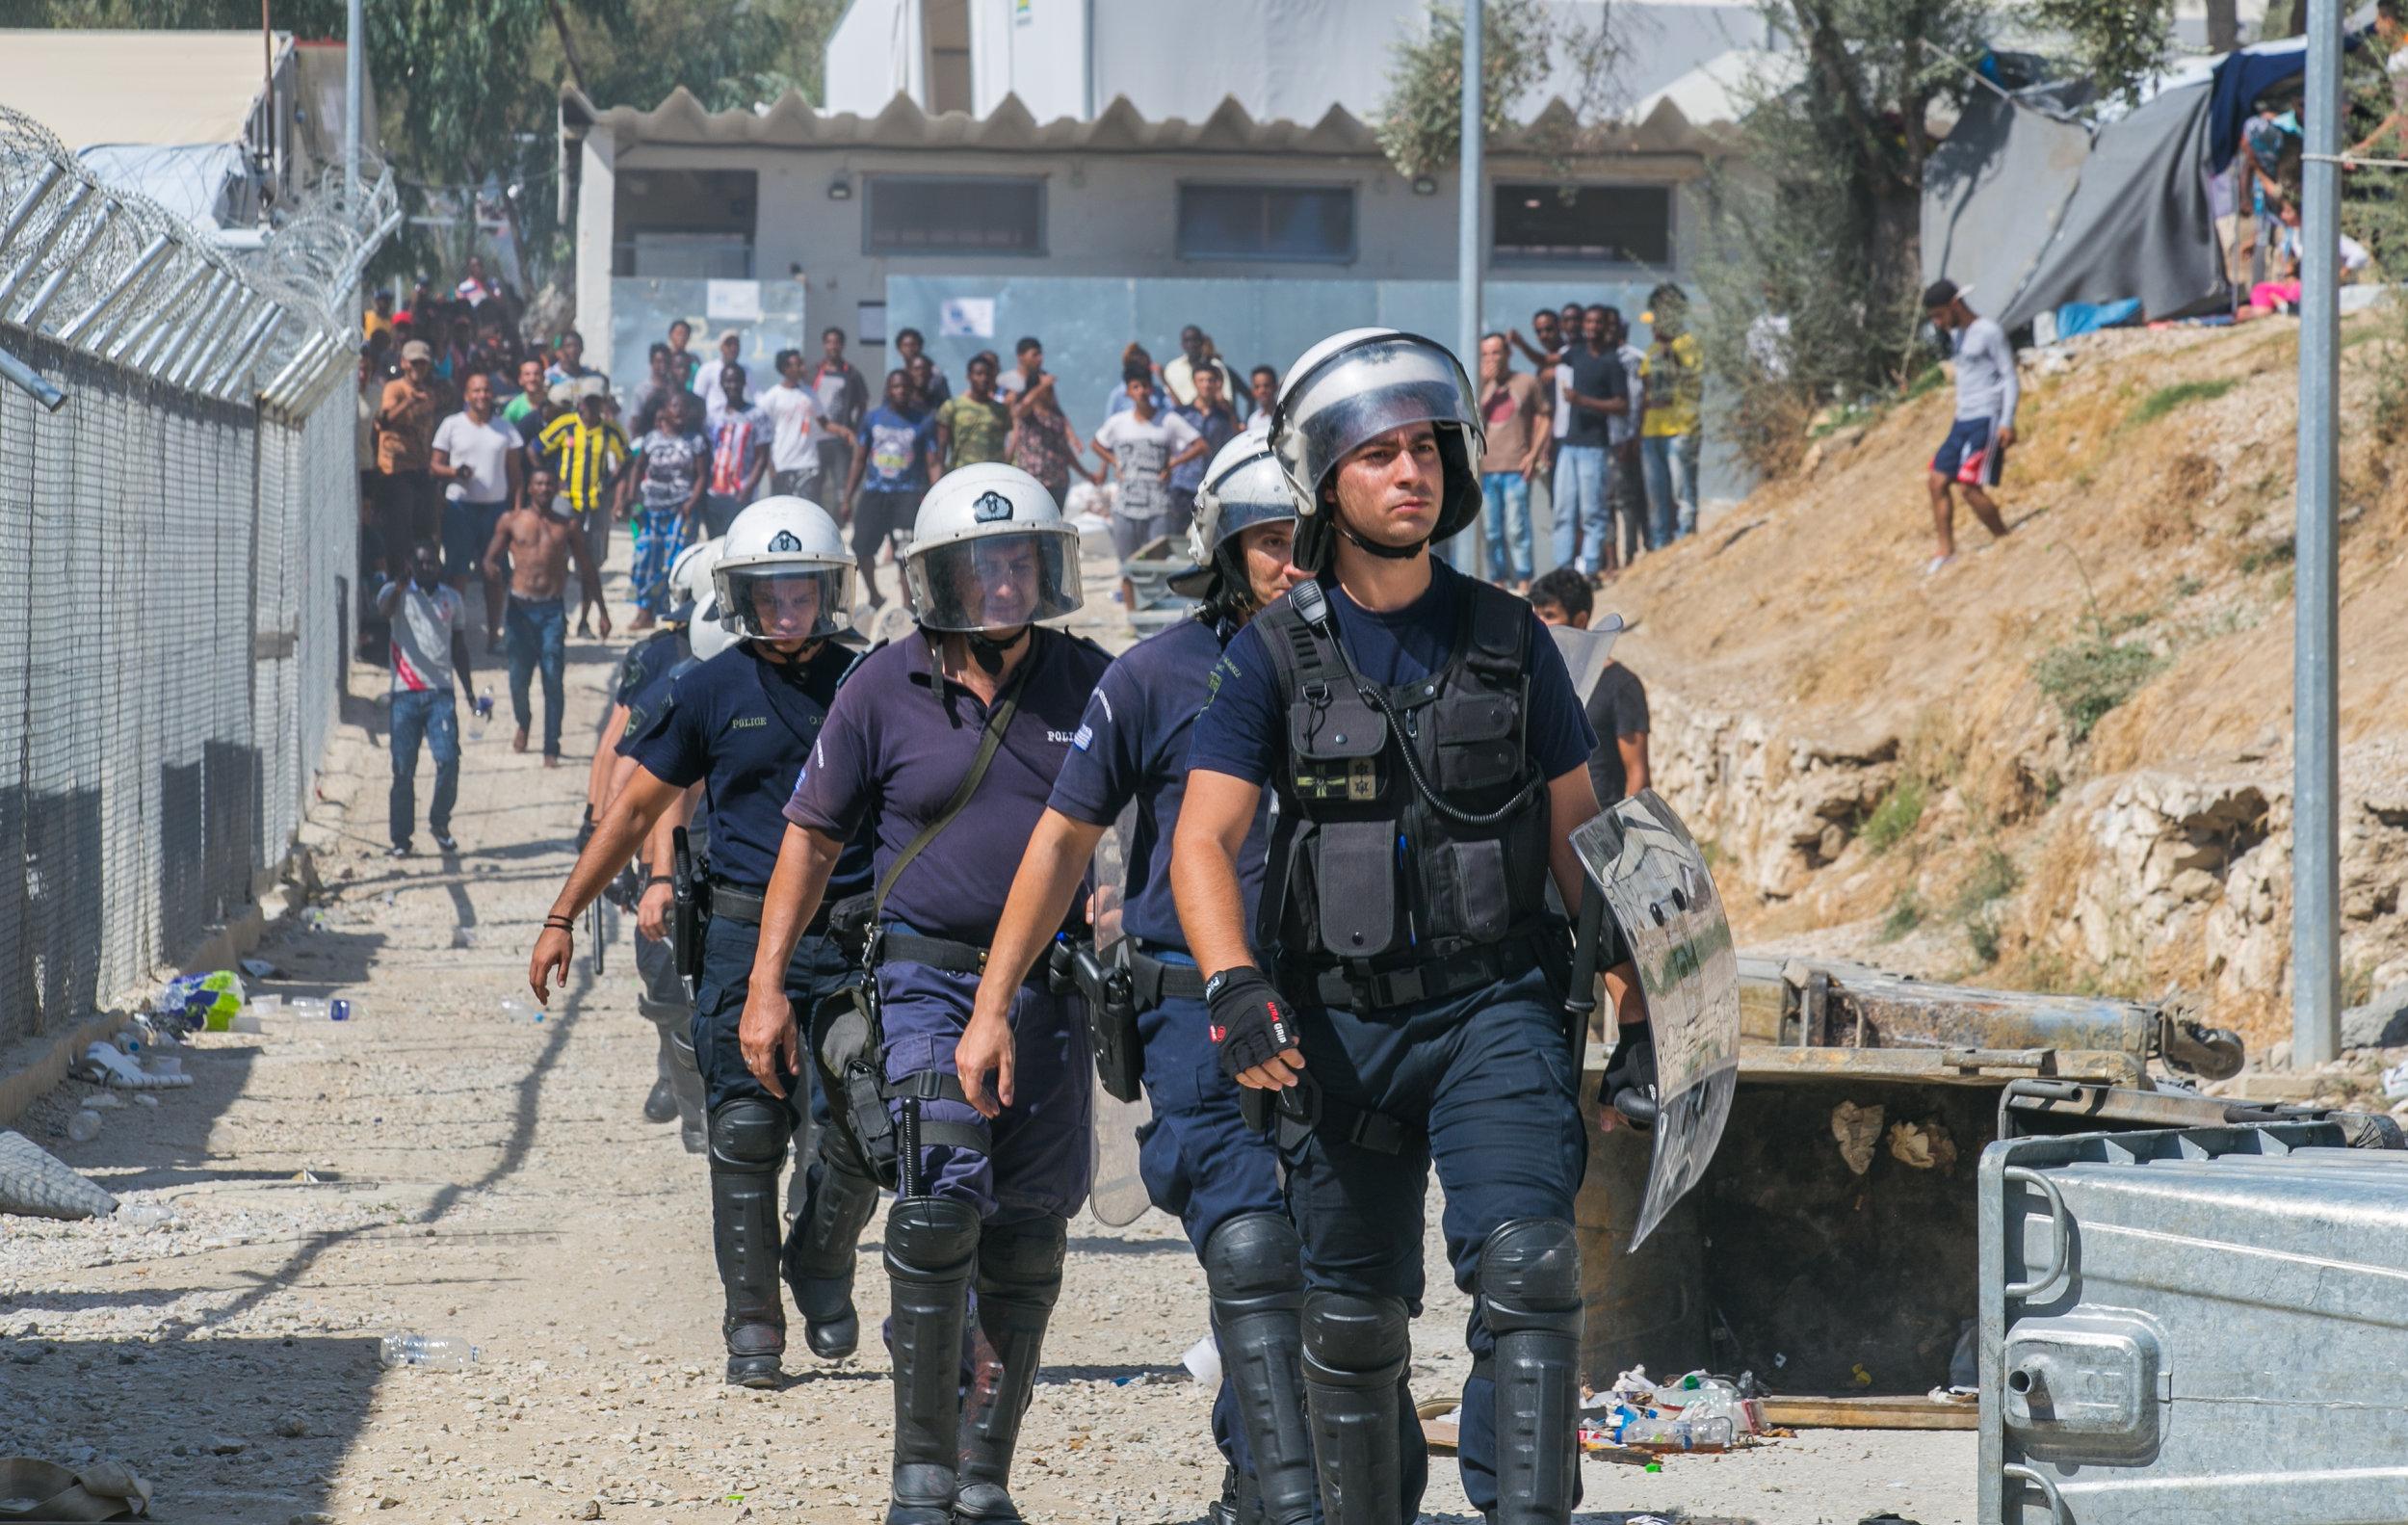 Moria Refugee Camp Riot Coverage - AP - Lesvos, Greece